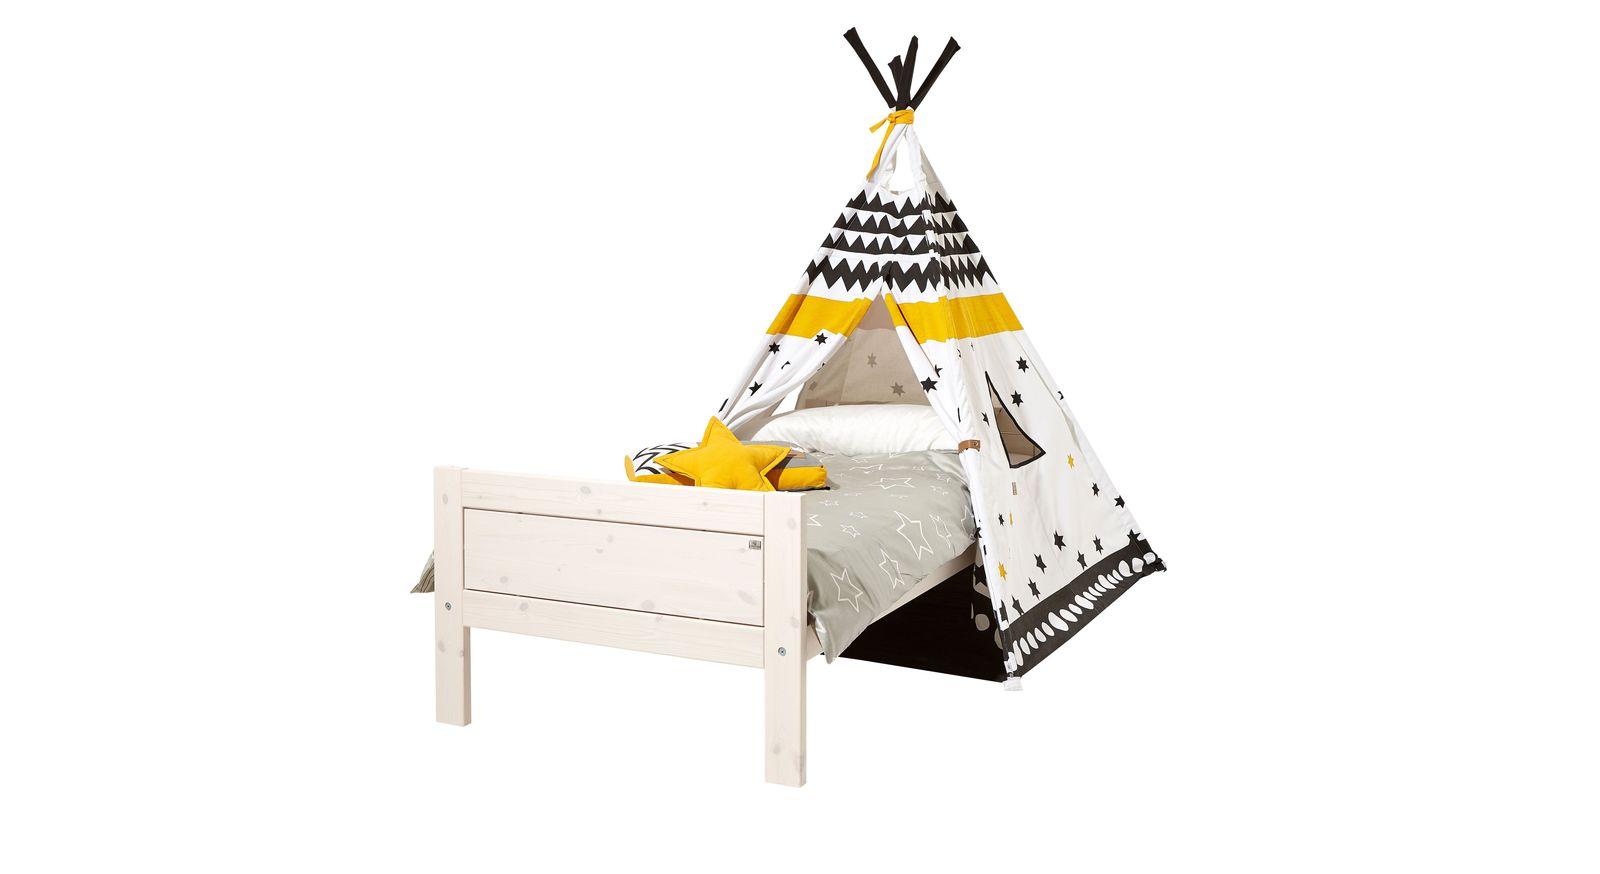 LIFETIME Schlafzelt Indian Sky mit Kinderbett